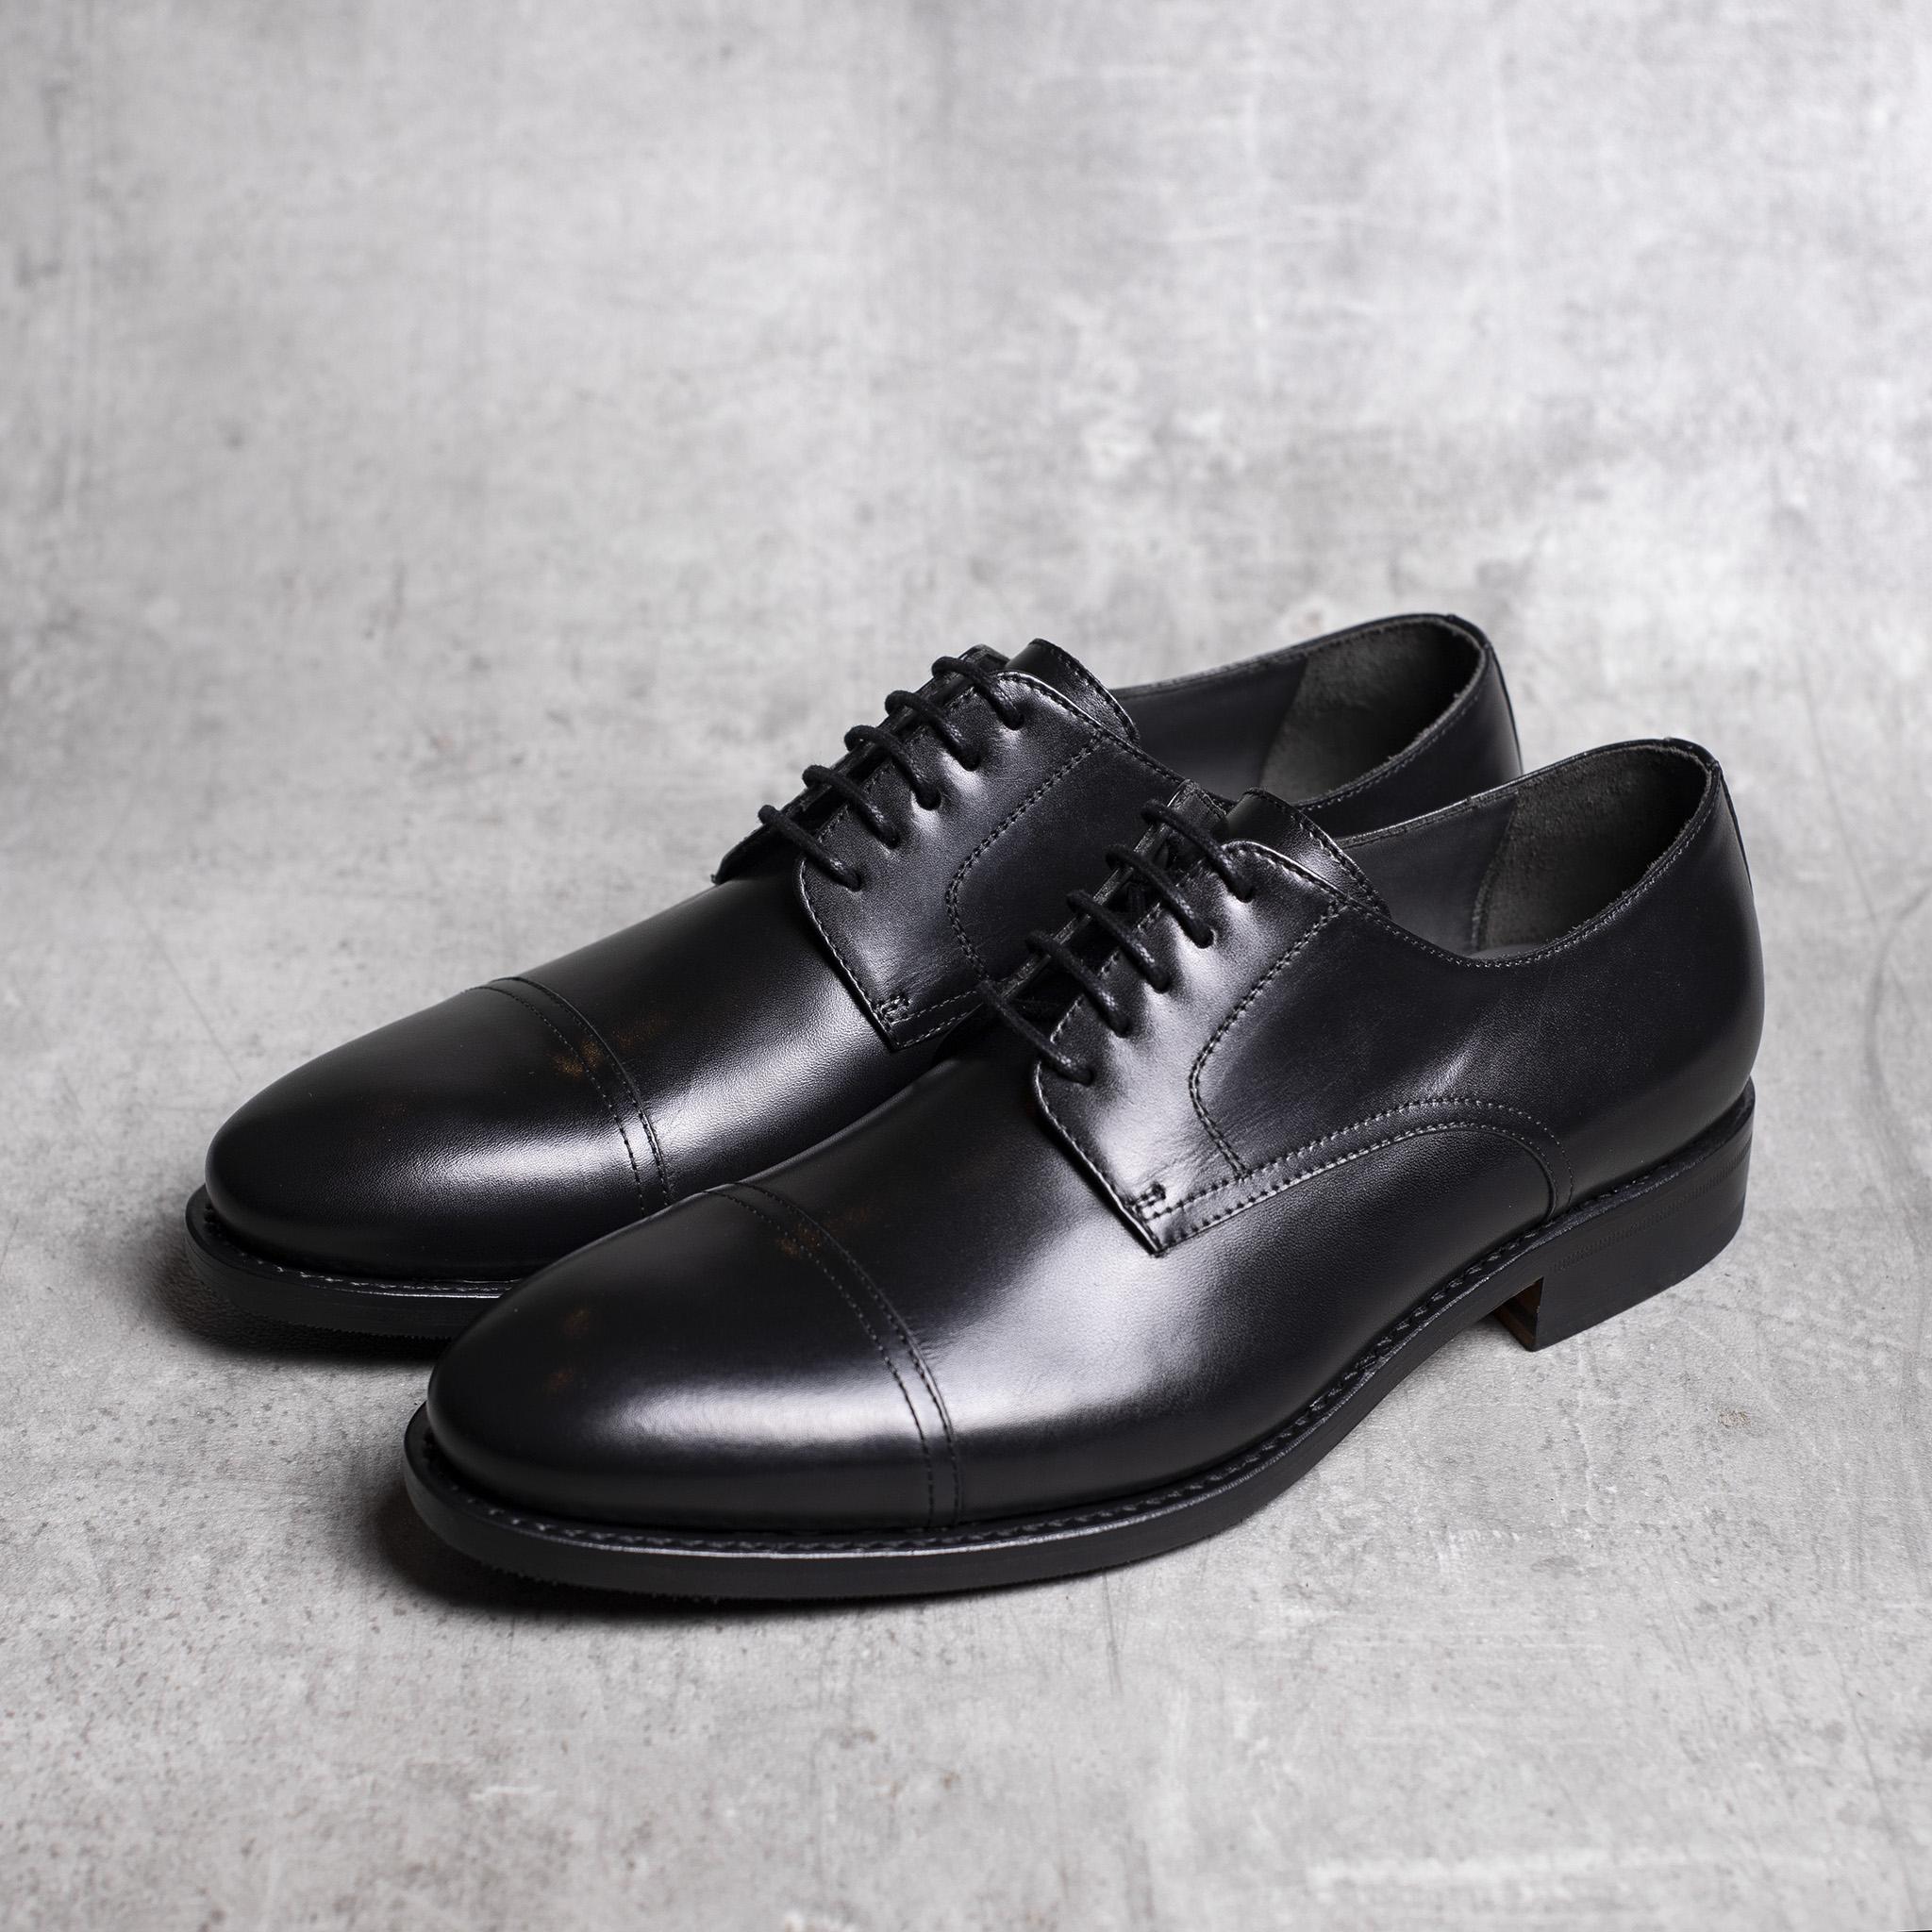 DERBY · 0649 Black leather The Seëlk 2